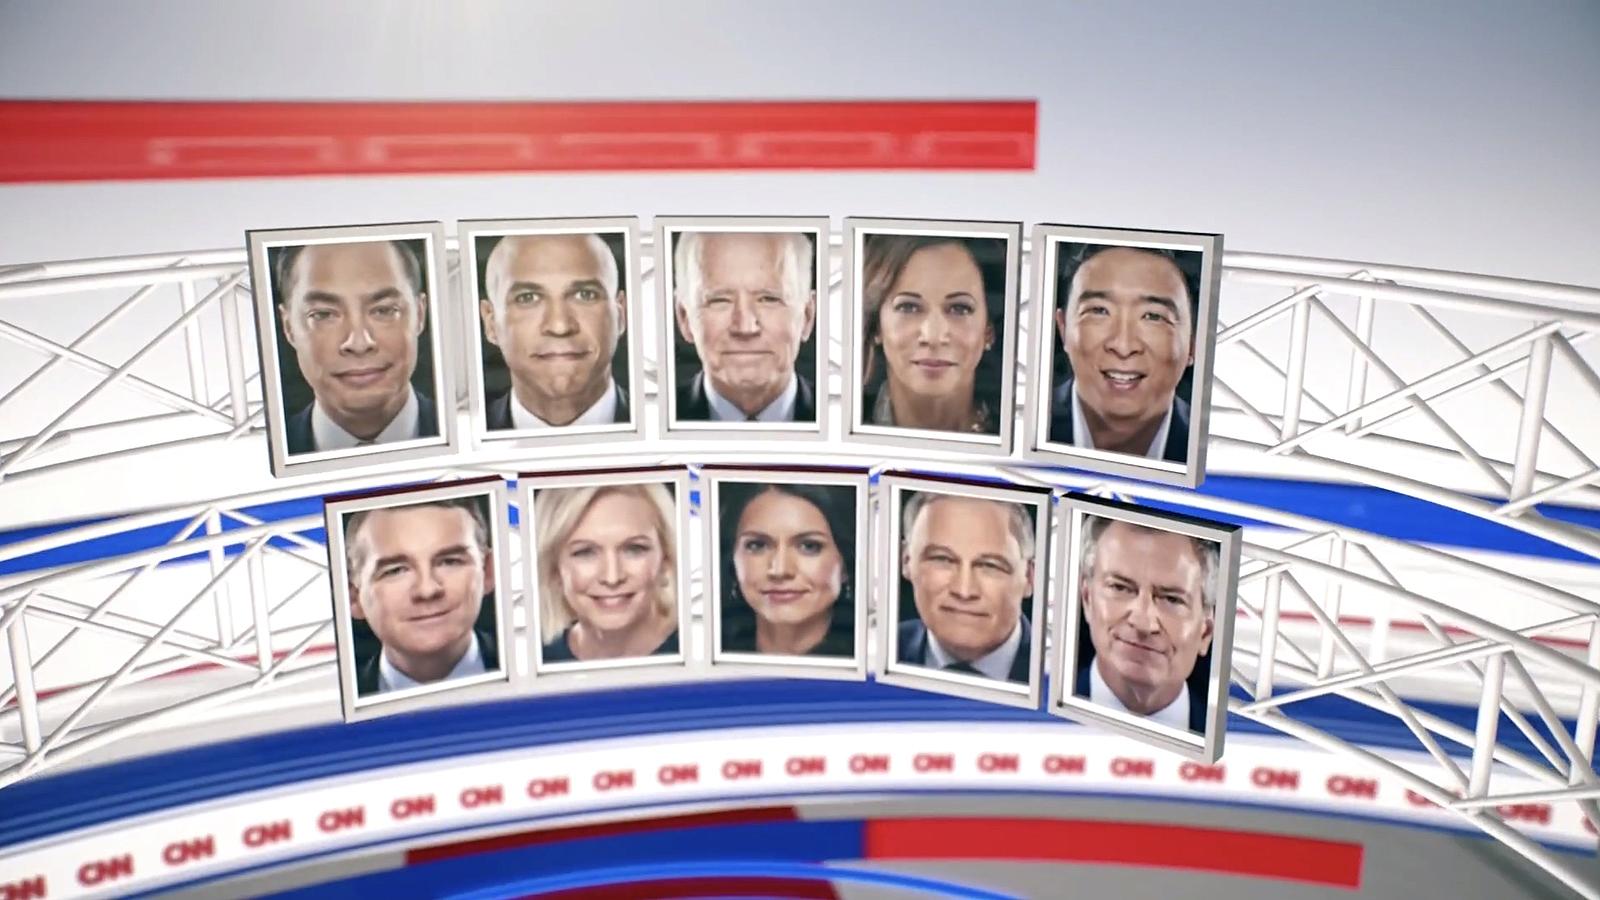 NCS_CNN-Dem-Debate-Cold-Open_Graphics_0018